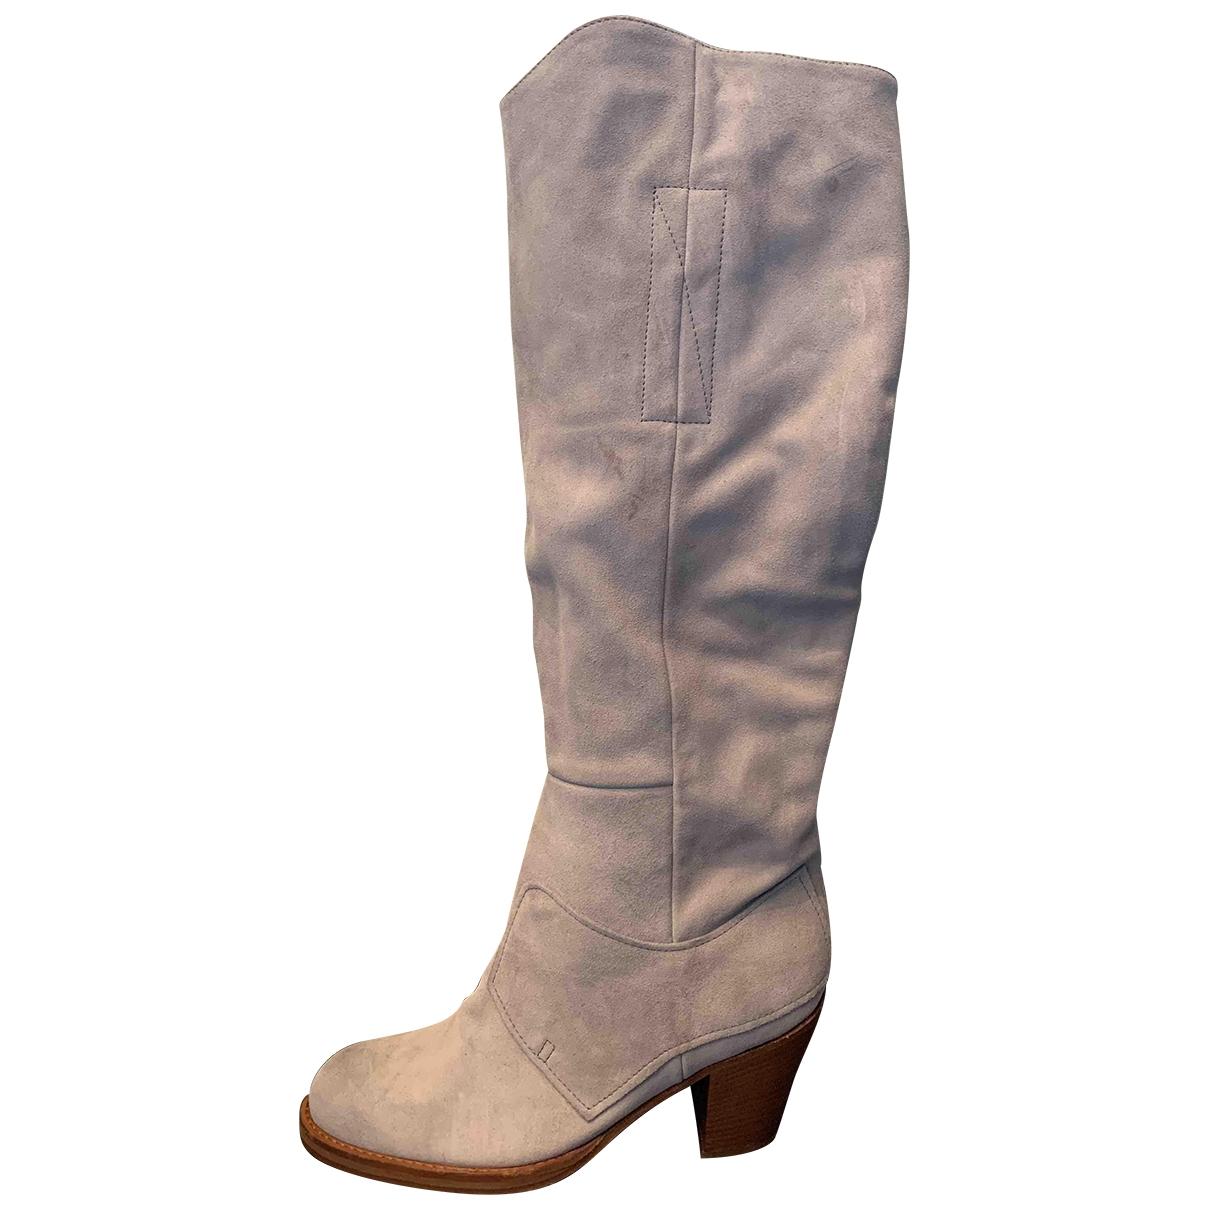 Acne Studios \N Grey Suede Boots for Women 39 EU